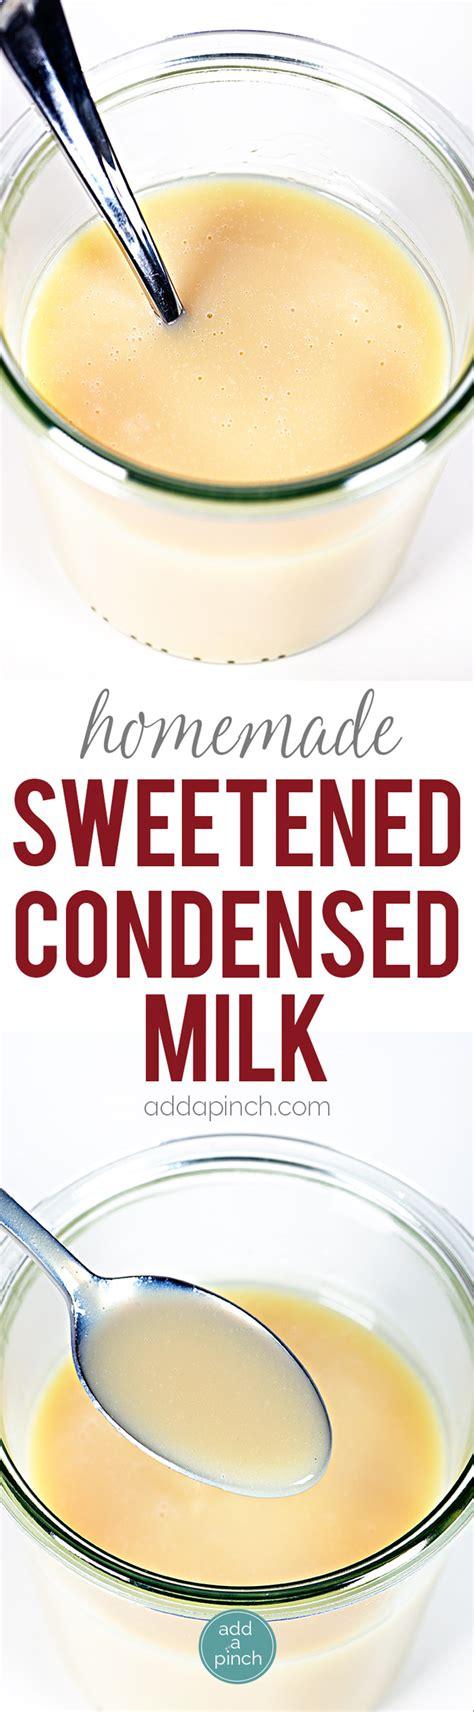 homemade sweetened condensed milk recipe add a pinch